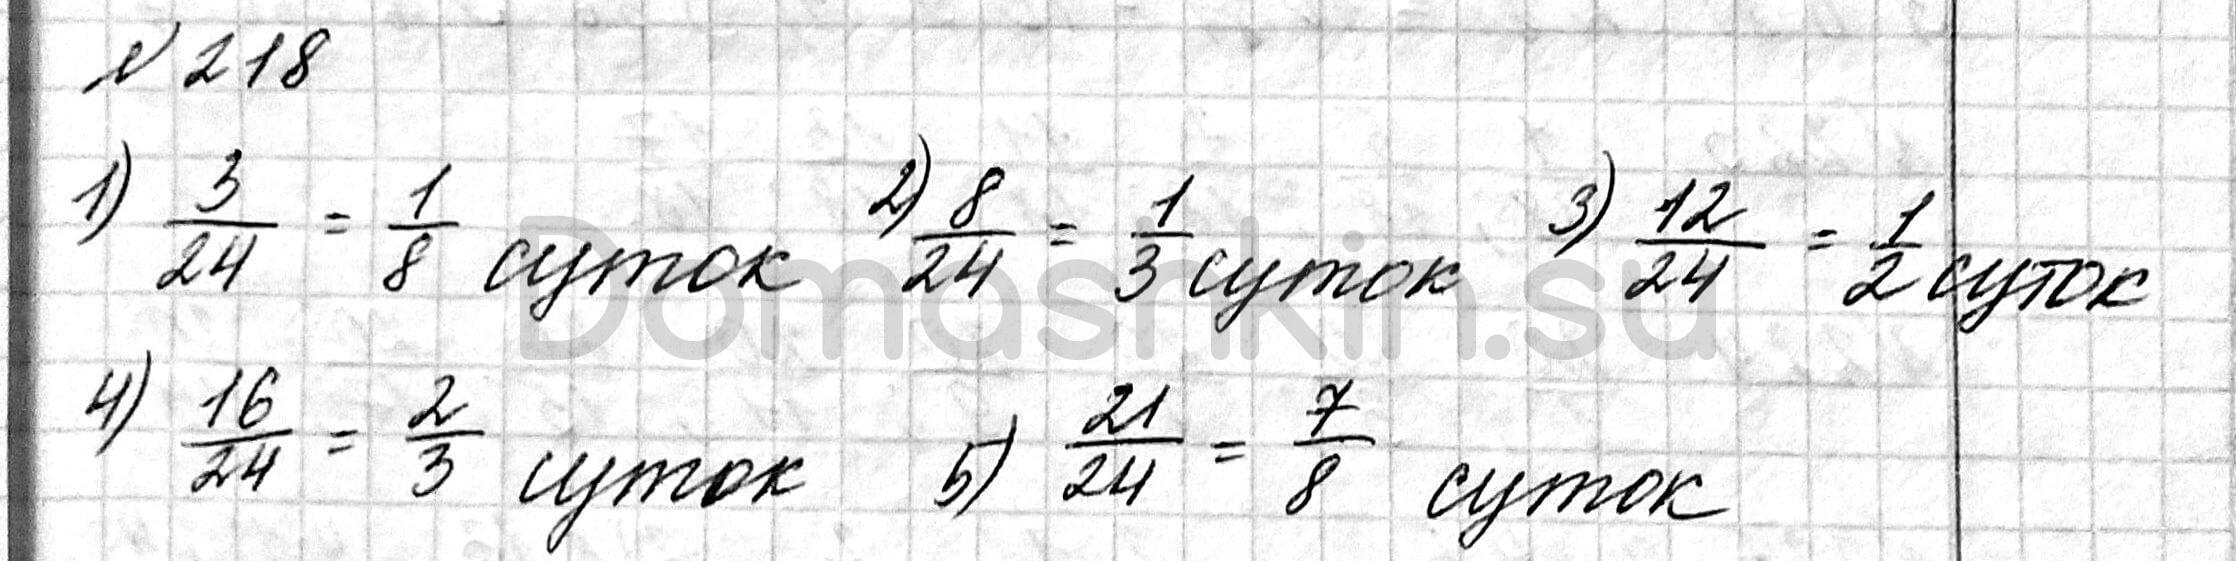 Математика 6 класс учебник Мерзляк номер 218 решение